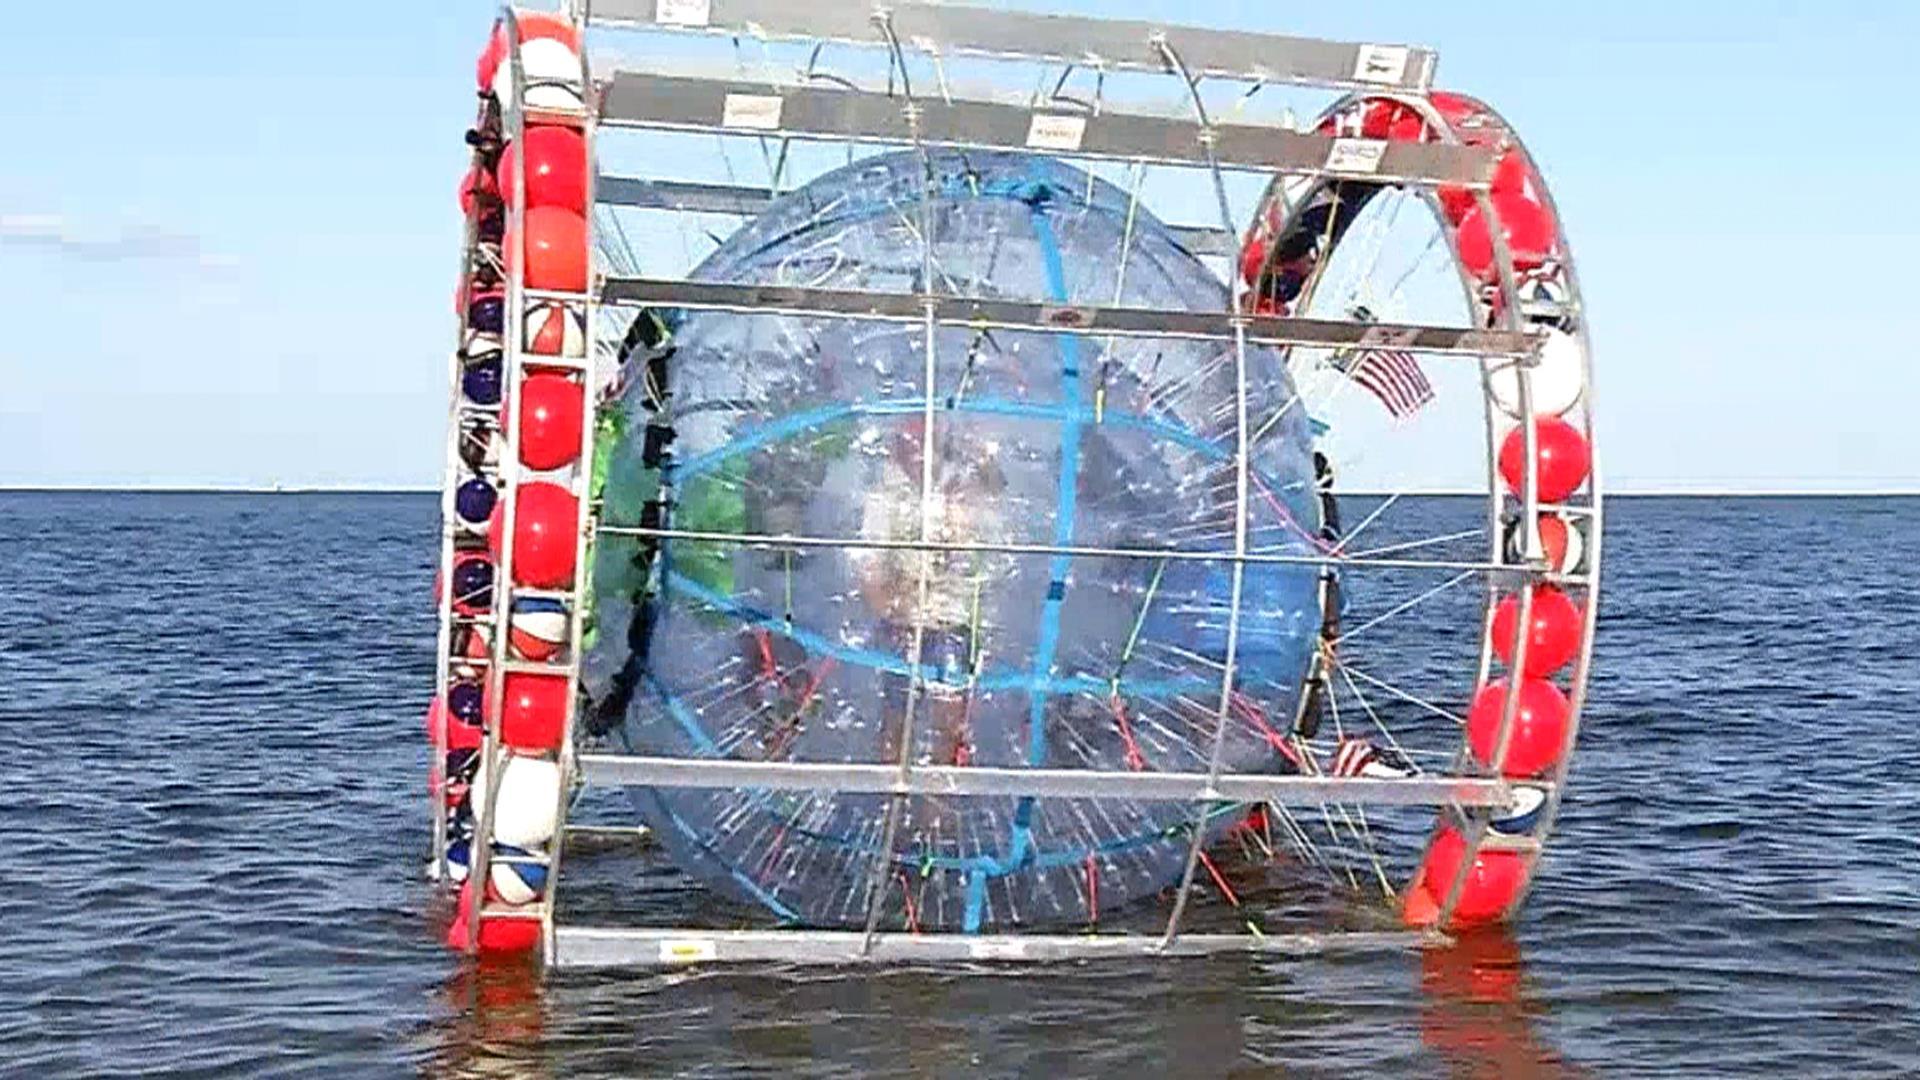 Man Attempts To Walk Across Ocean In Bubble Nbc News